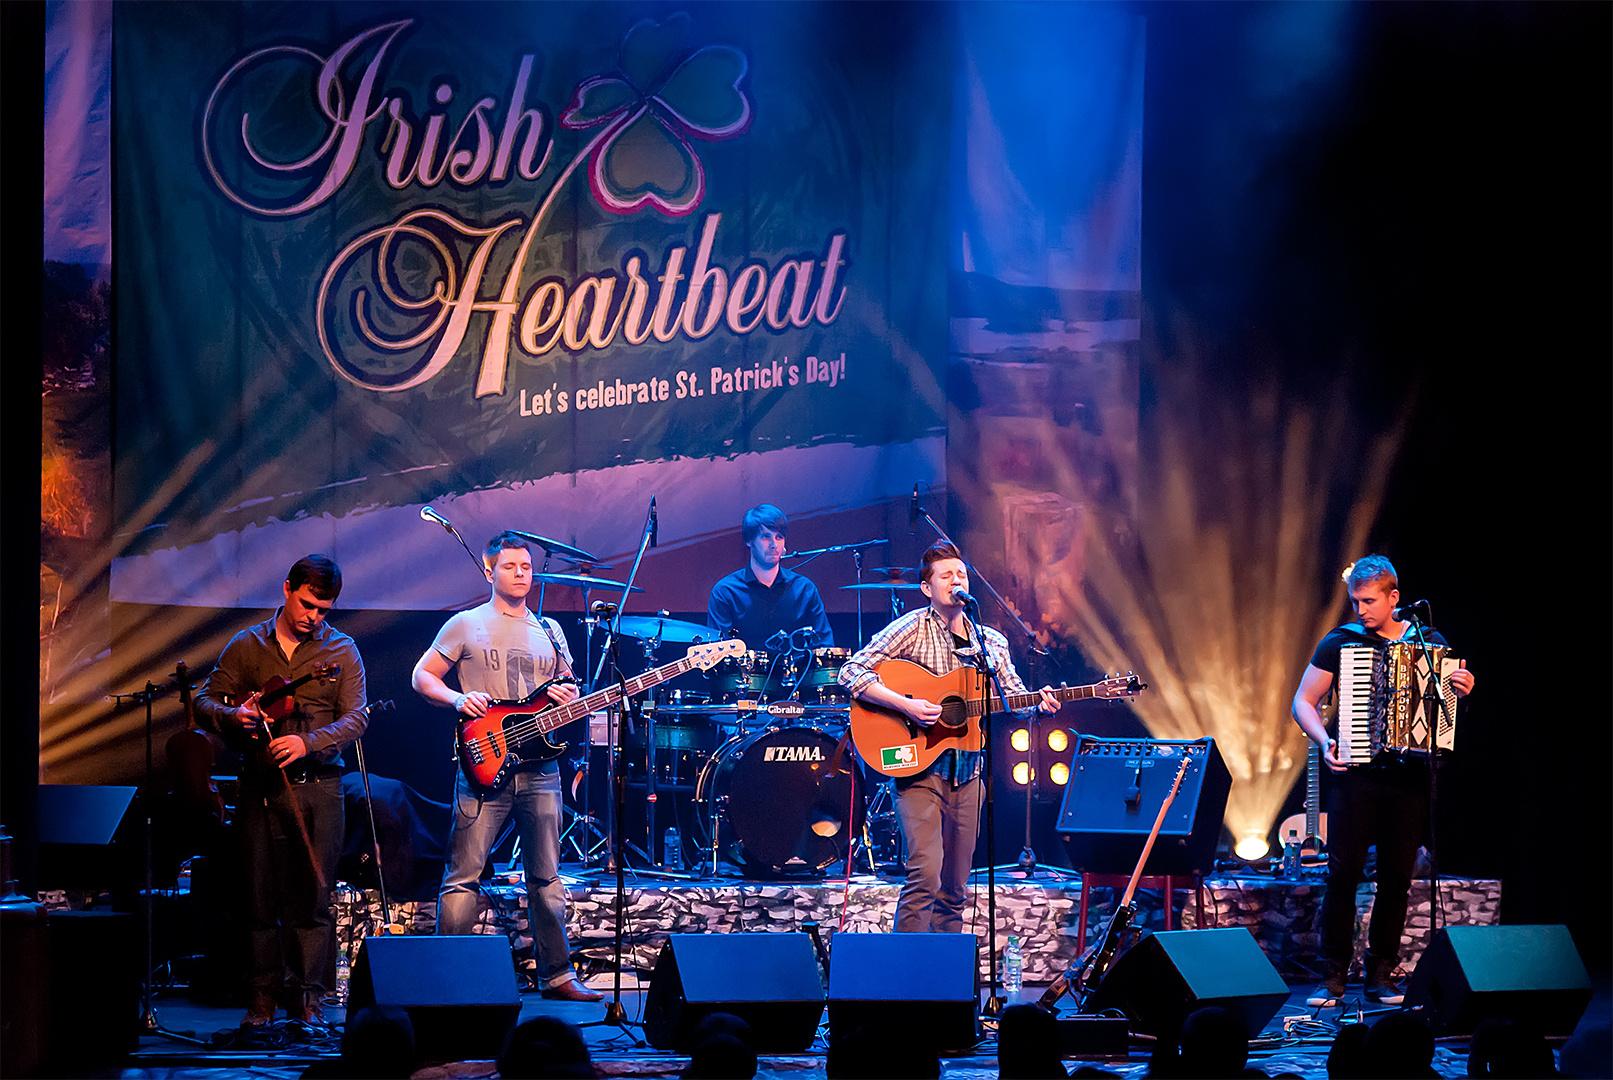 Irish Heartbeat 2013 - Skerryvore